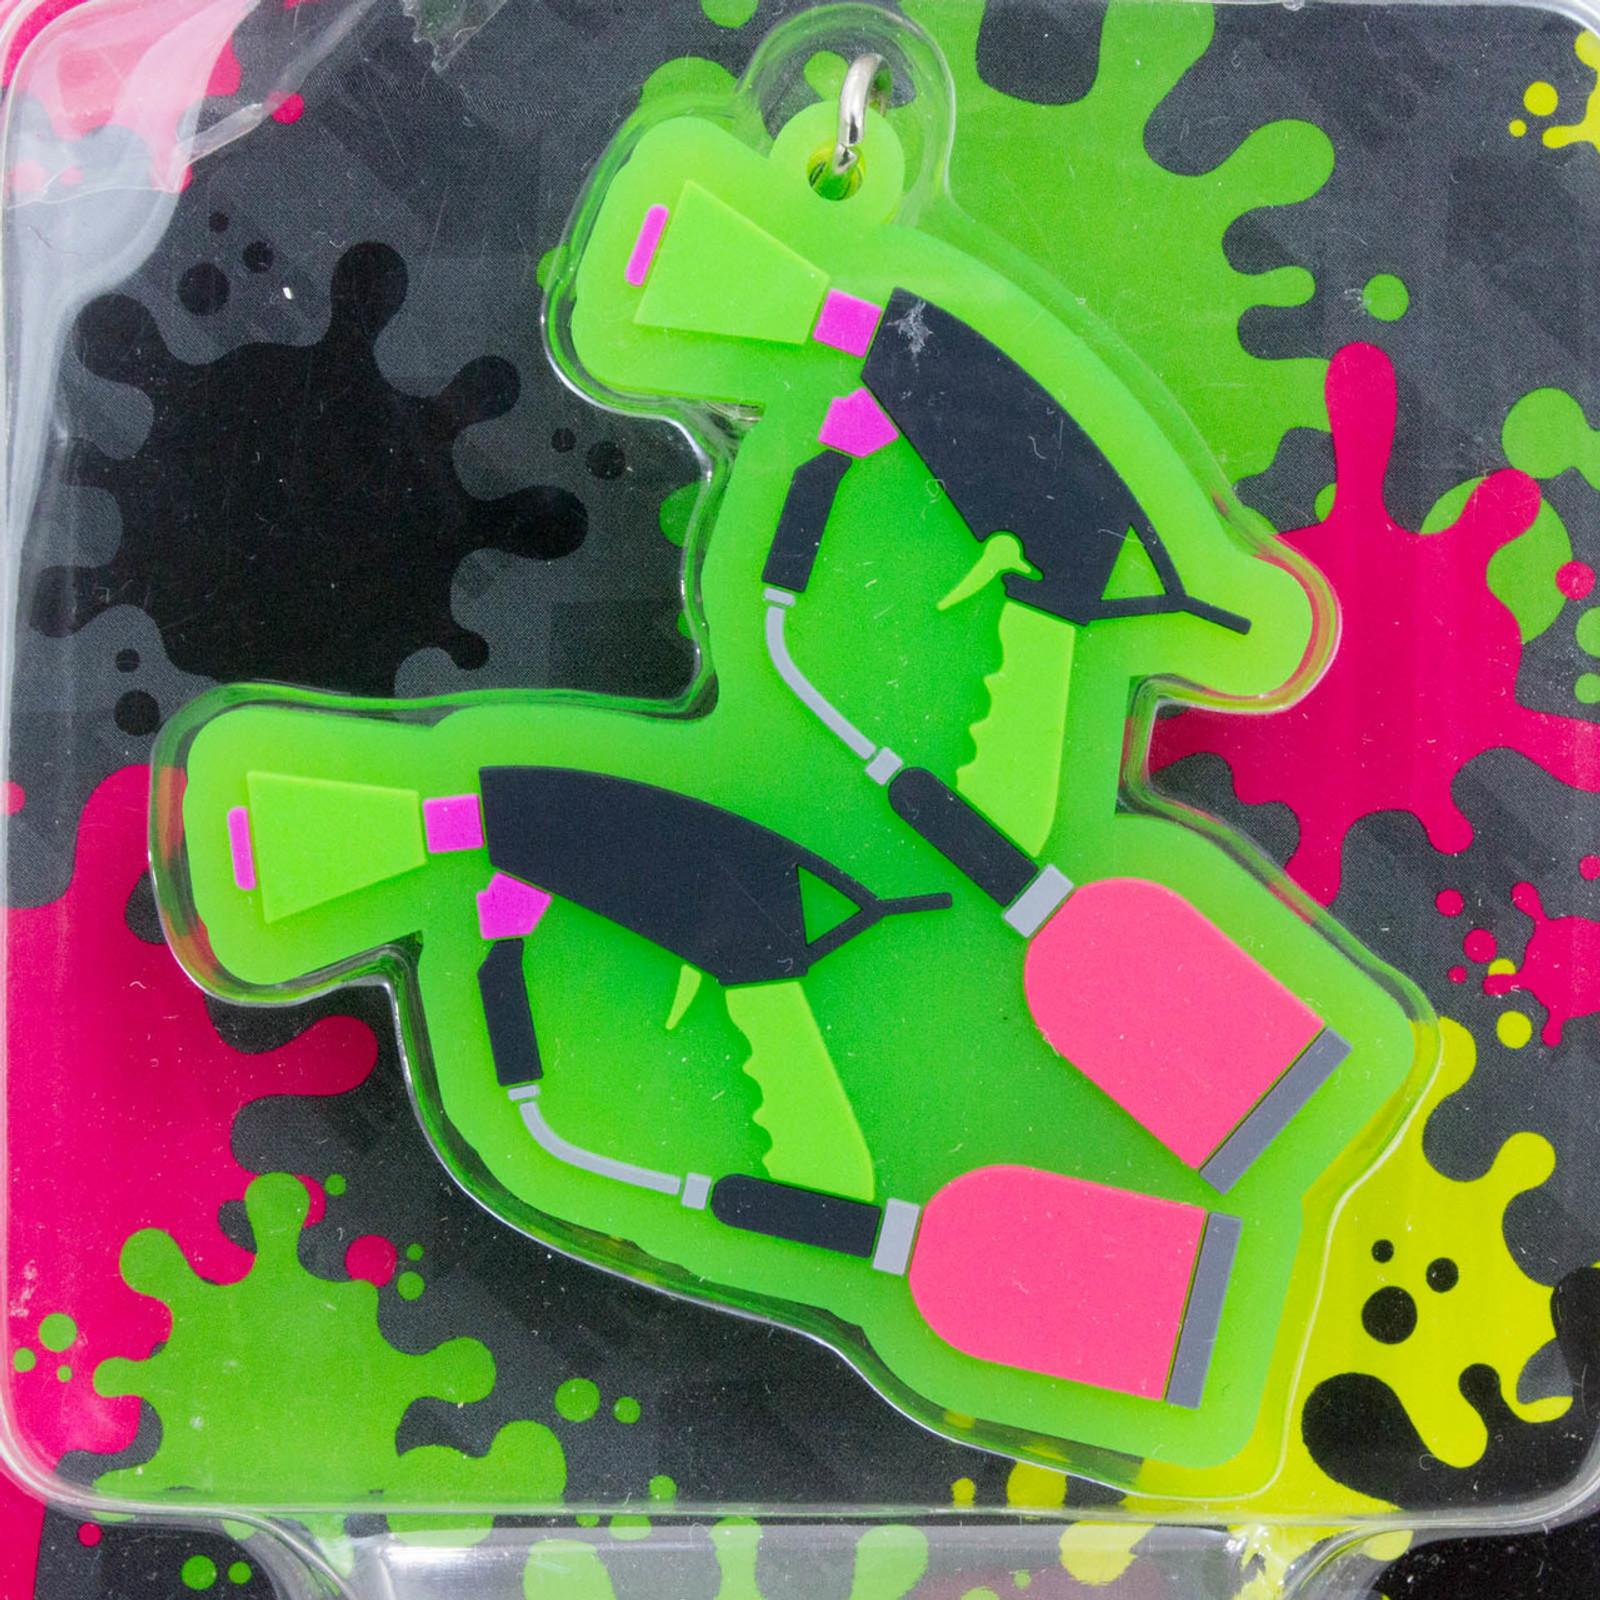 Splatoon 2 Splat Dualies Rubber Charm Collection JAPAN Nintendo Switch